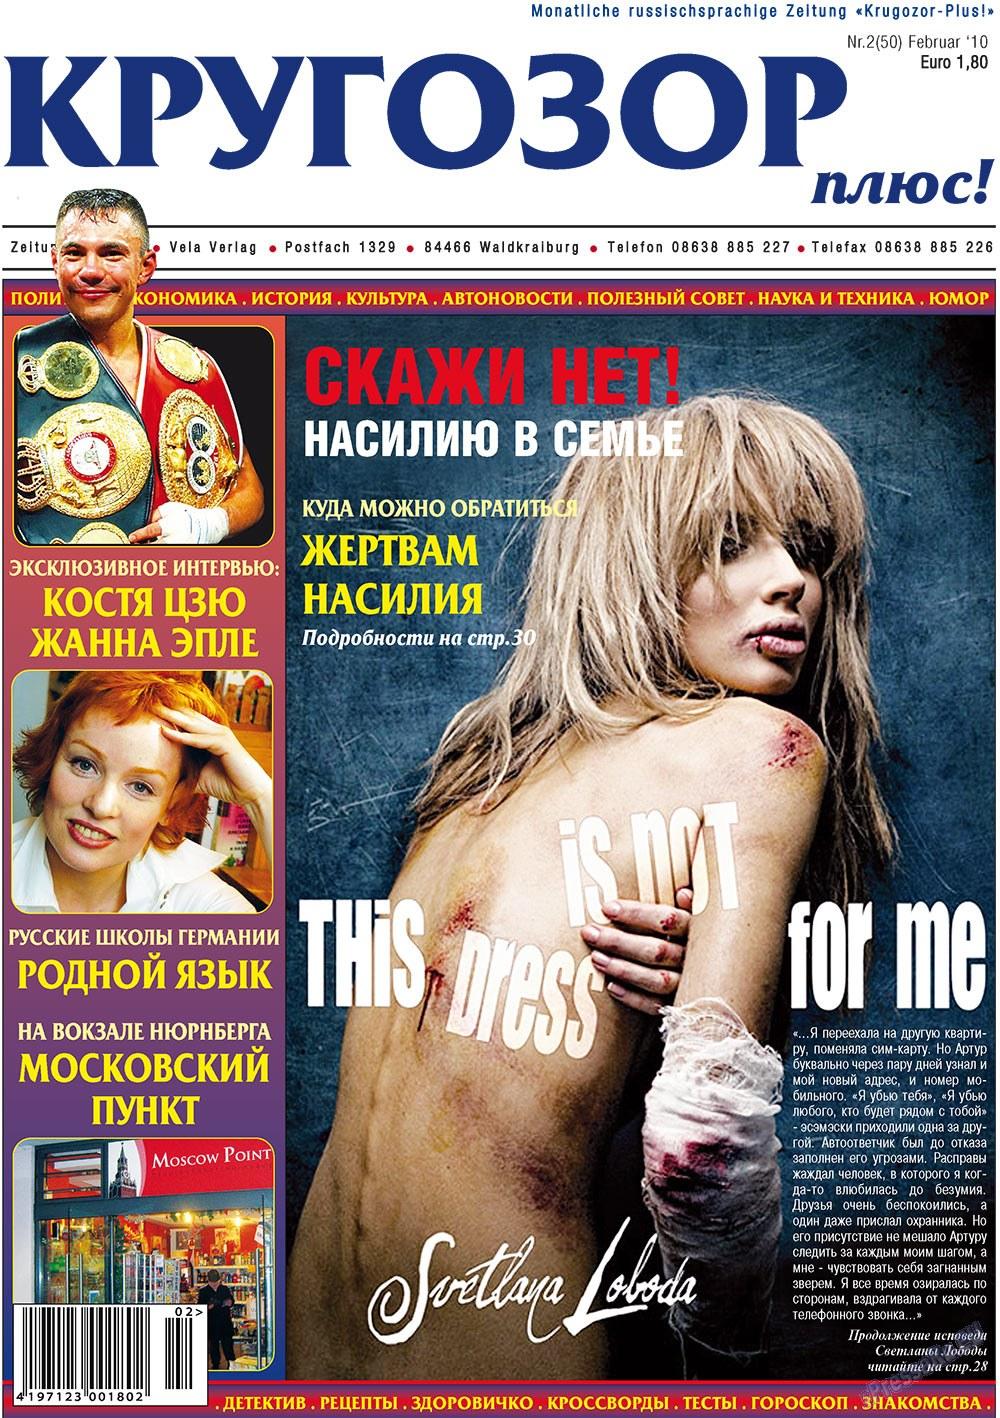 Кругозор плюс! (газета). 2010 год, номер 2, стр. 1